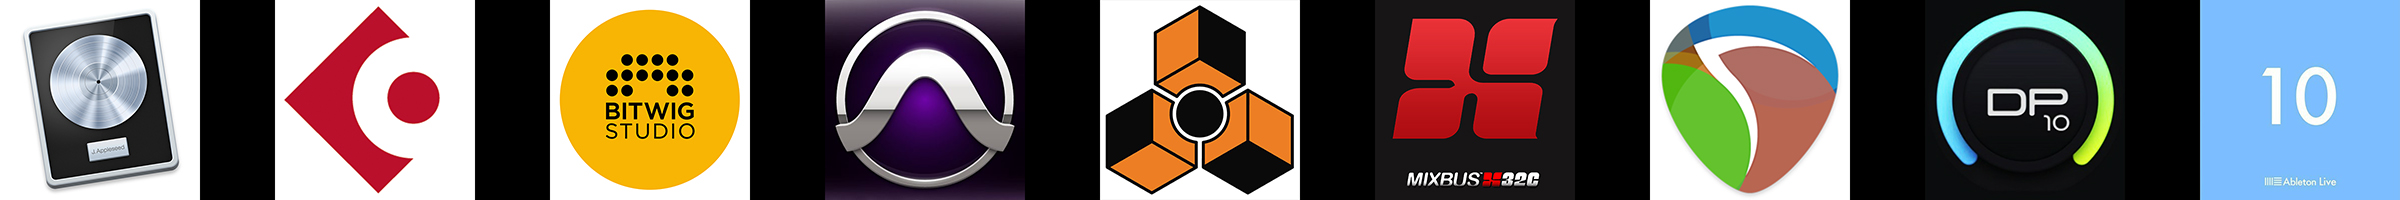 DAW Logos 1B.jpg